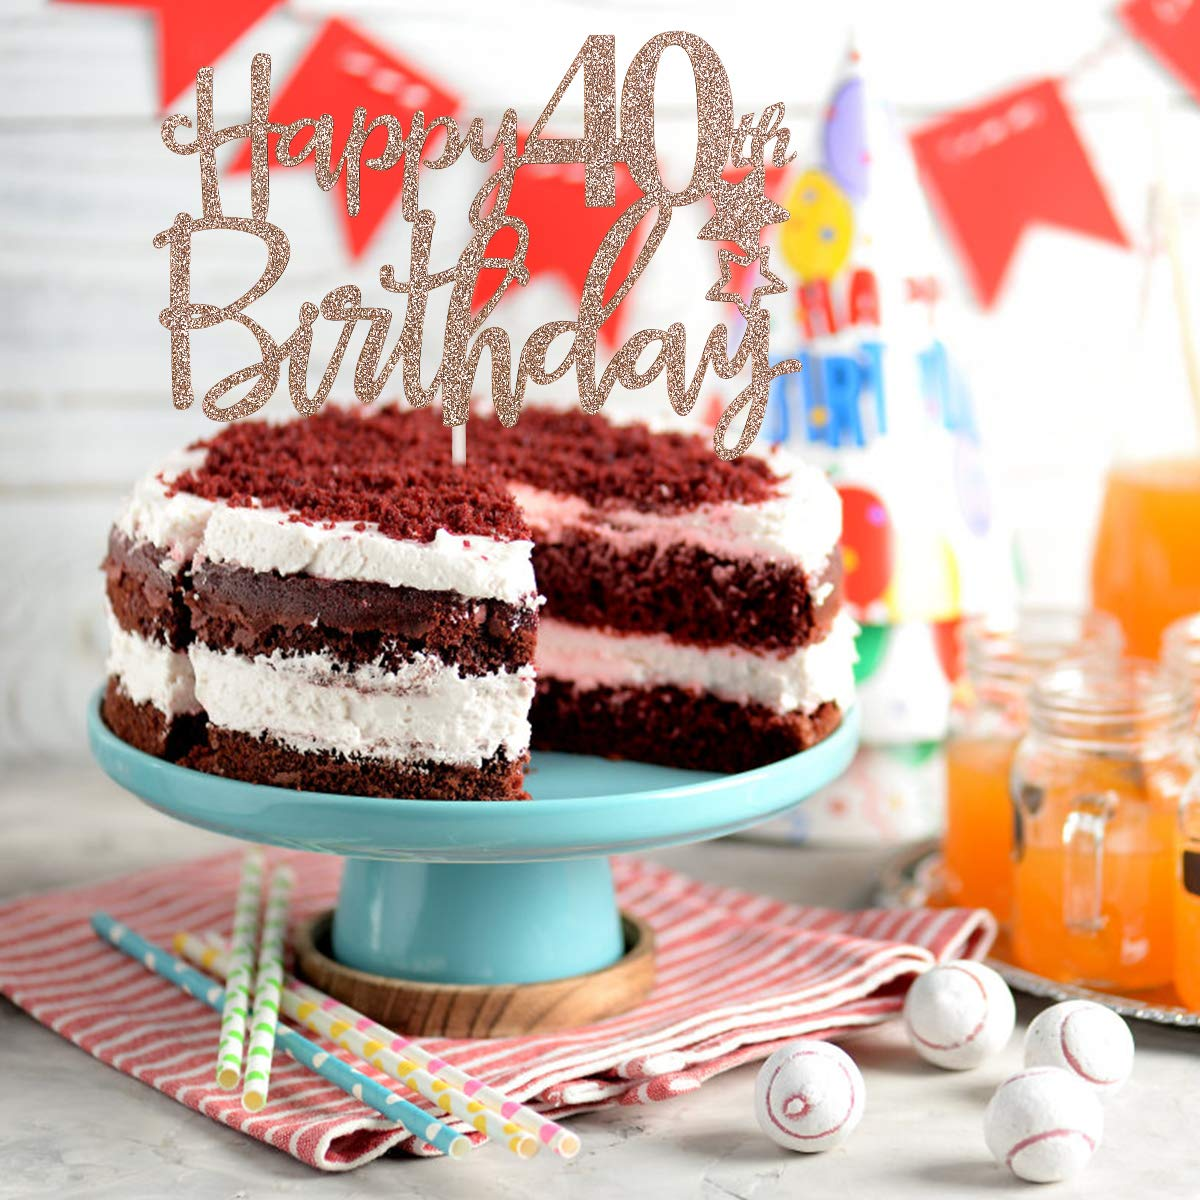 Rose Gold Glittery Happy 40th Birthday Cake Topper,40th Birthday Party Decorations,Birthday Cake Decor